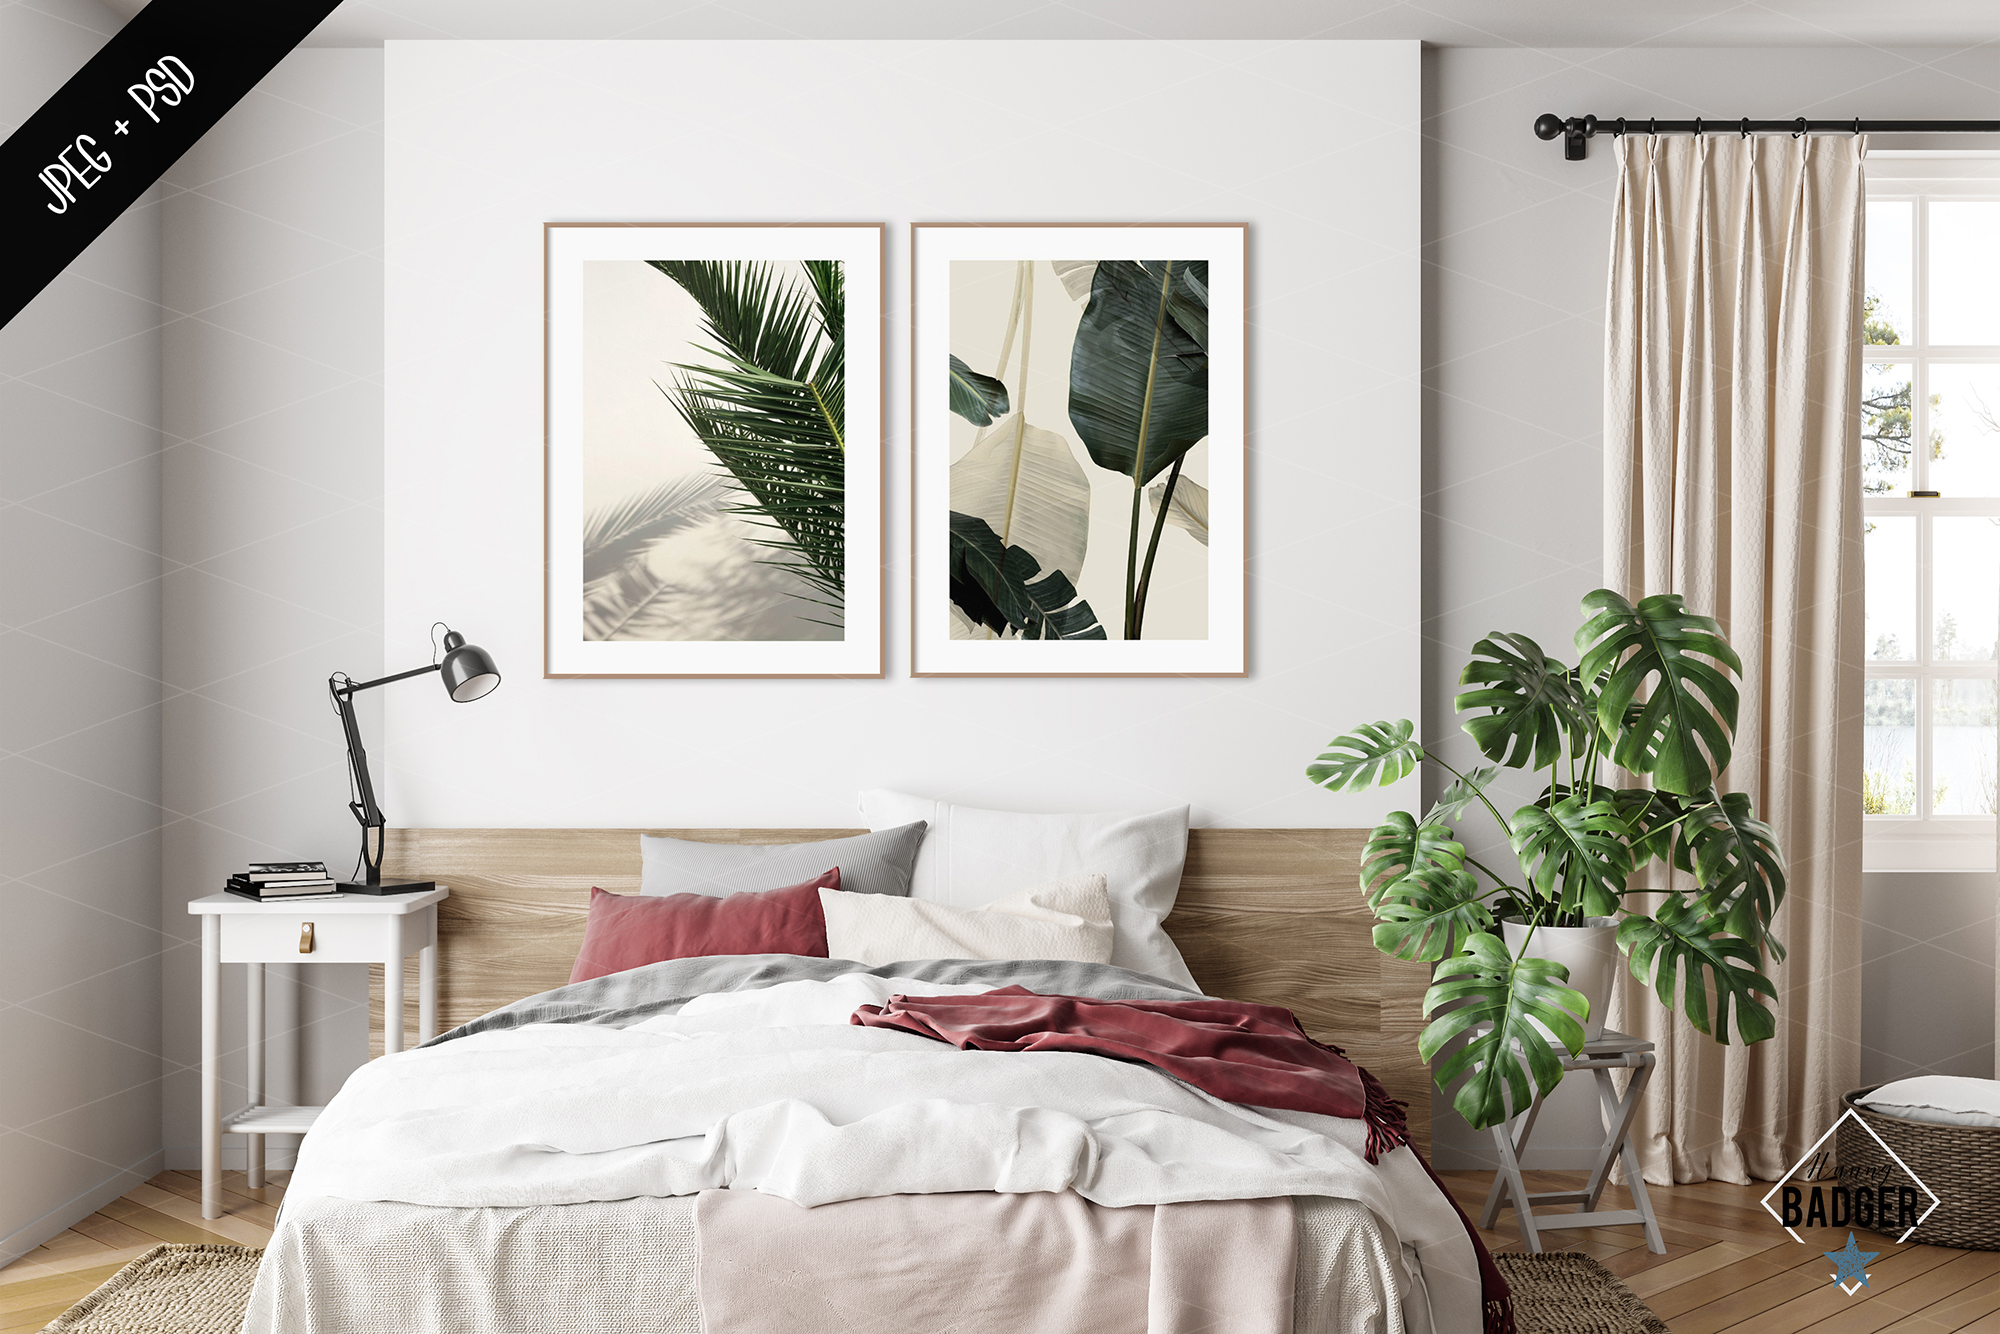 Interior mockup BUNDLE - frame & wall mockup creator example image 10